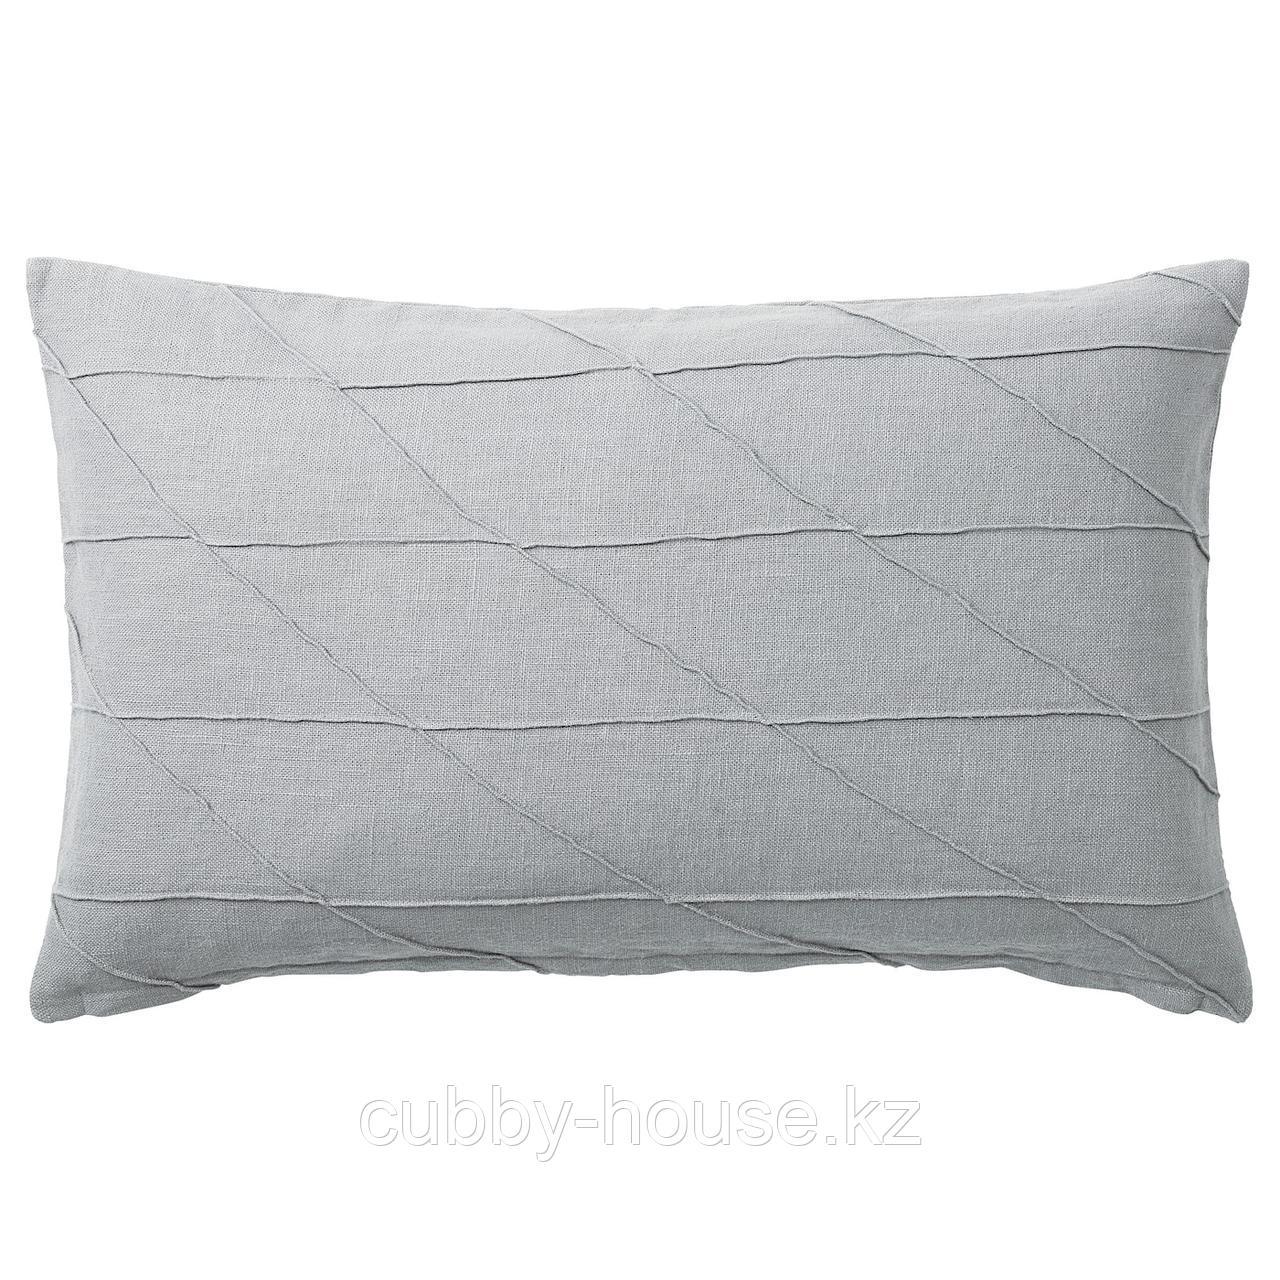 ХАРЁРТ Подушка, серый, 40x65 см